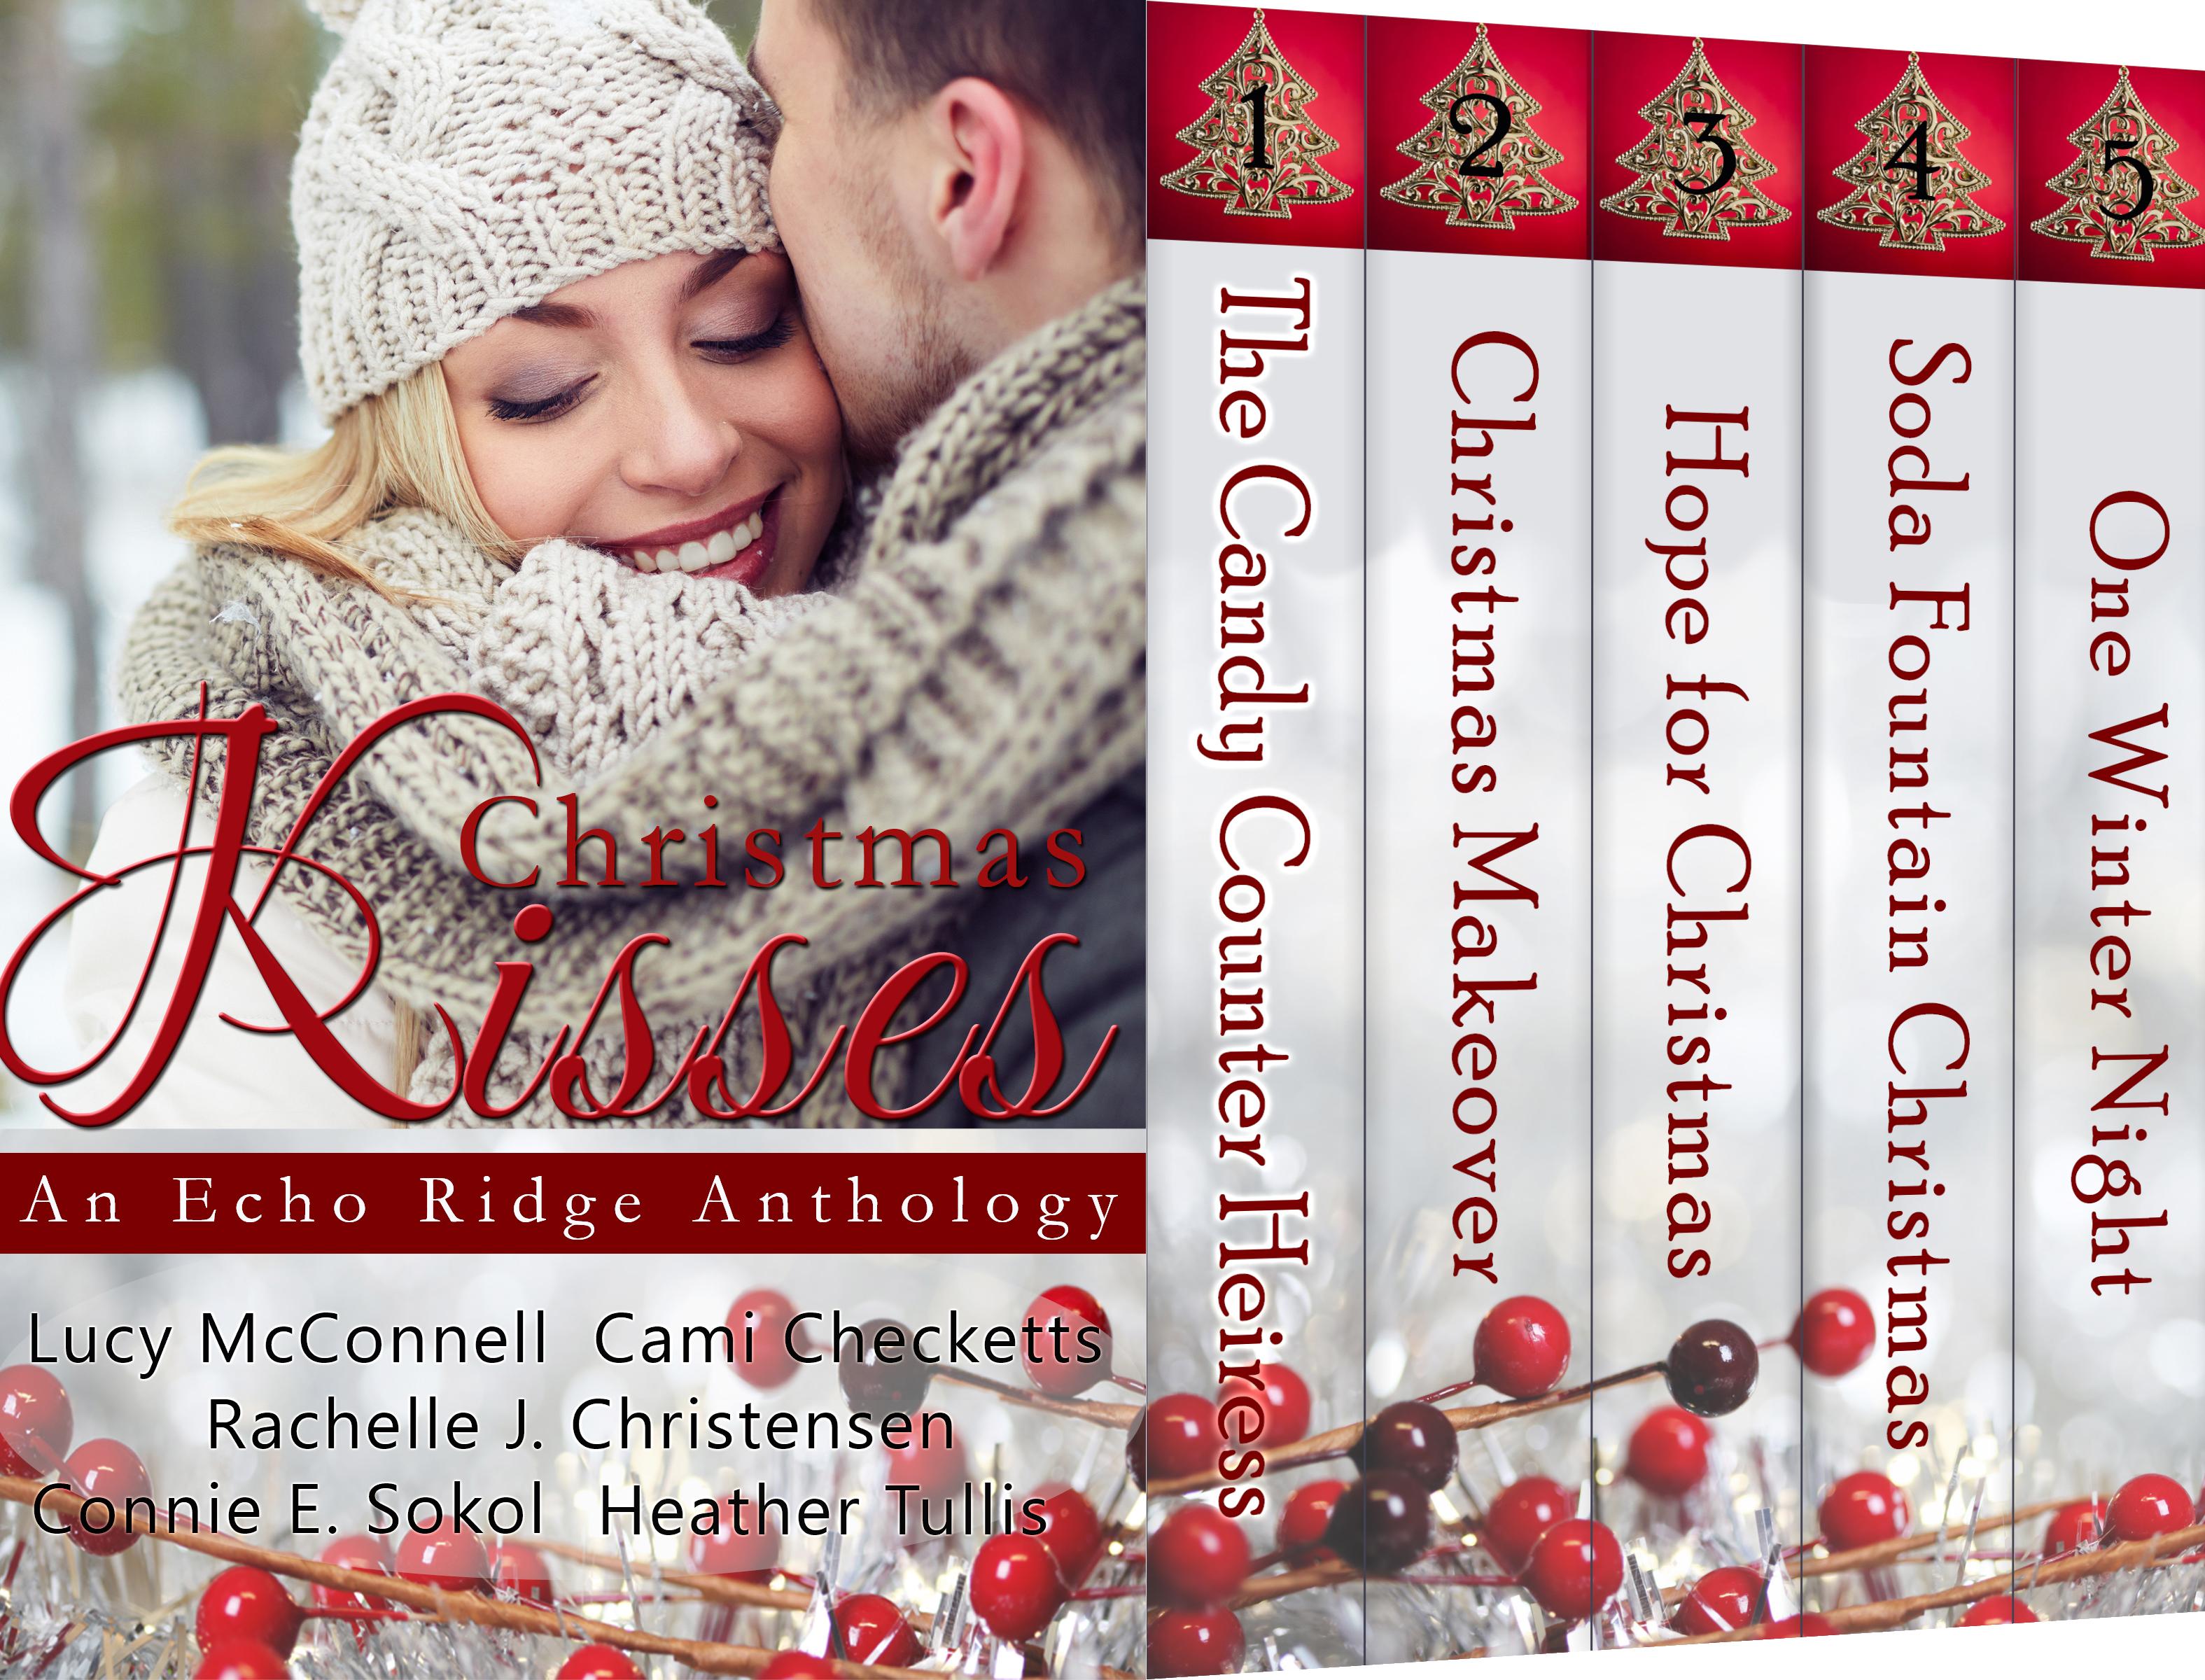 Christmas Kisses Anthology